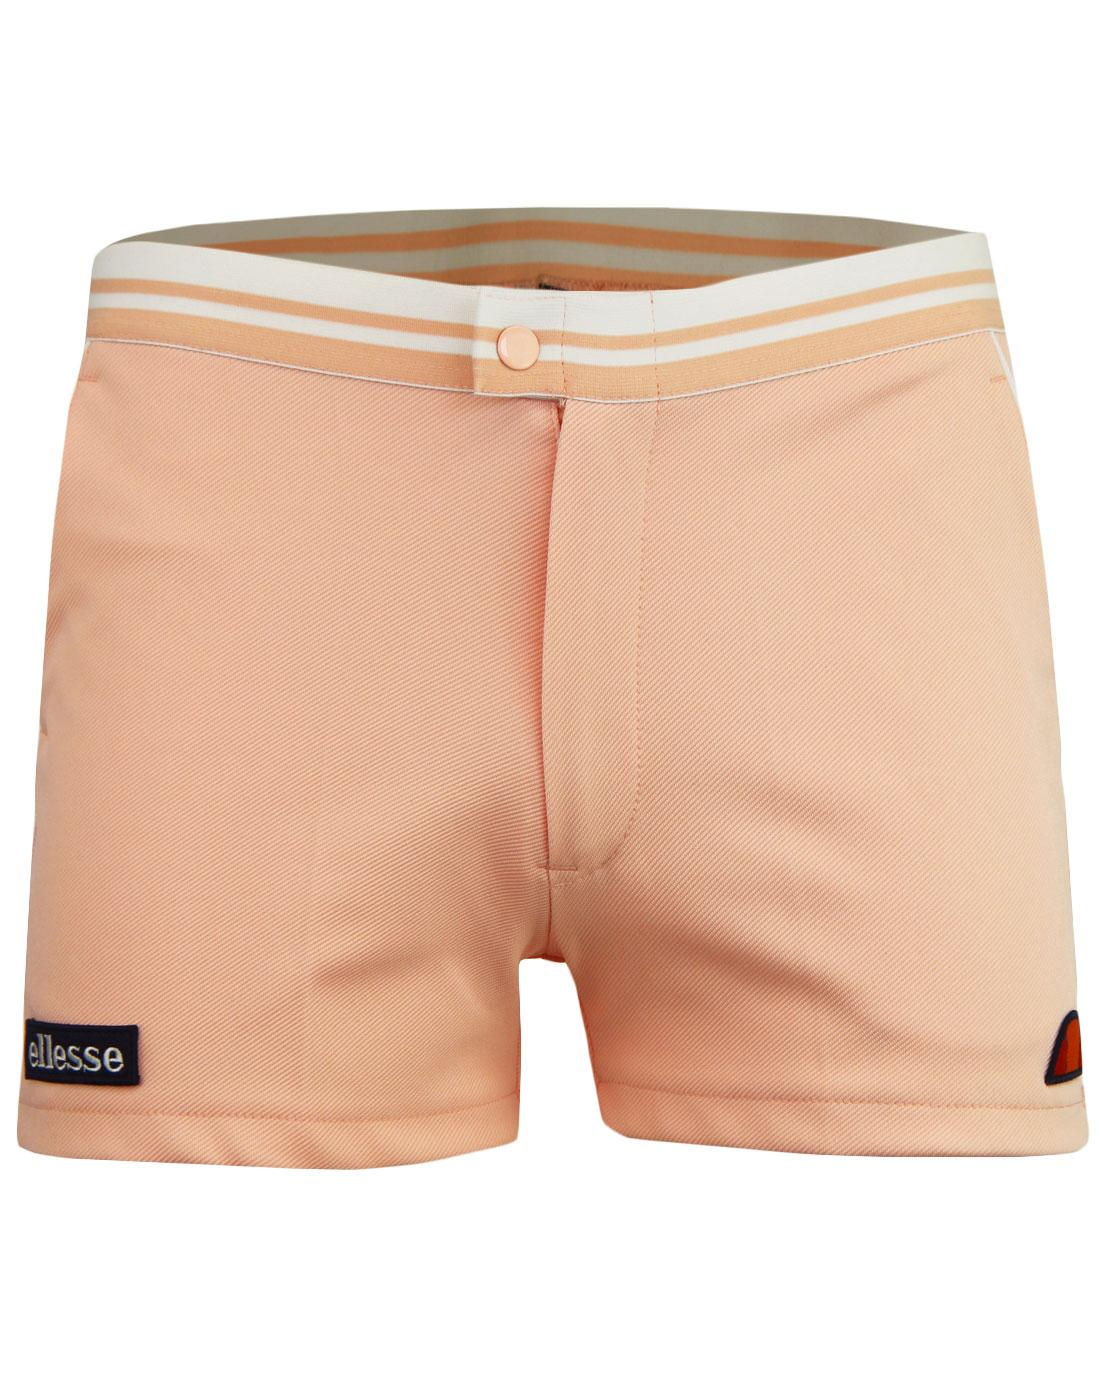 Tortoreto ELLESSE 80s Casuals Tennis Shorts (SC)